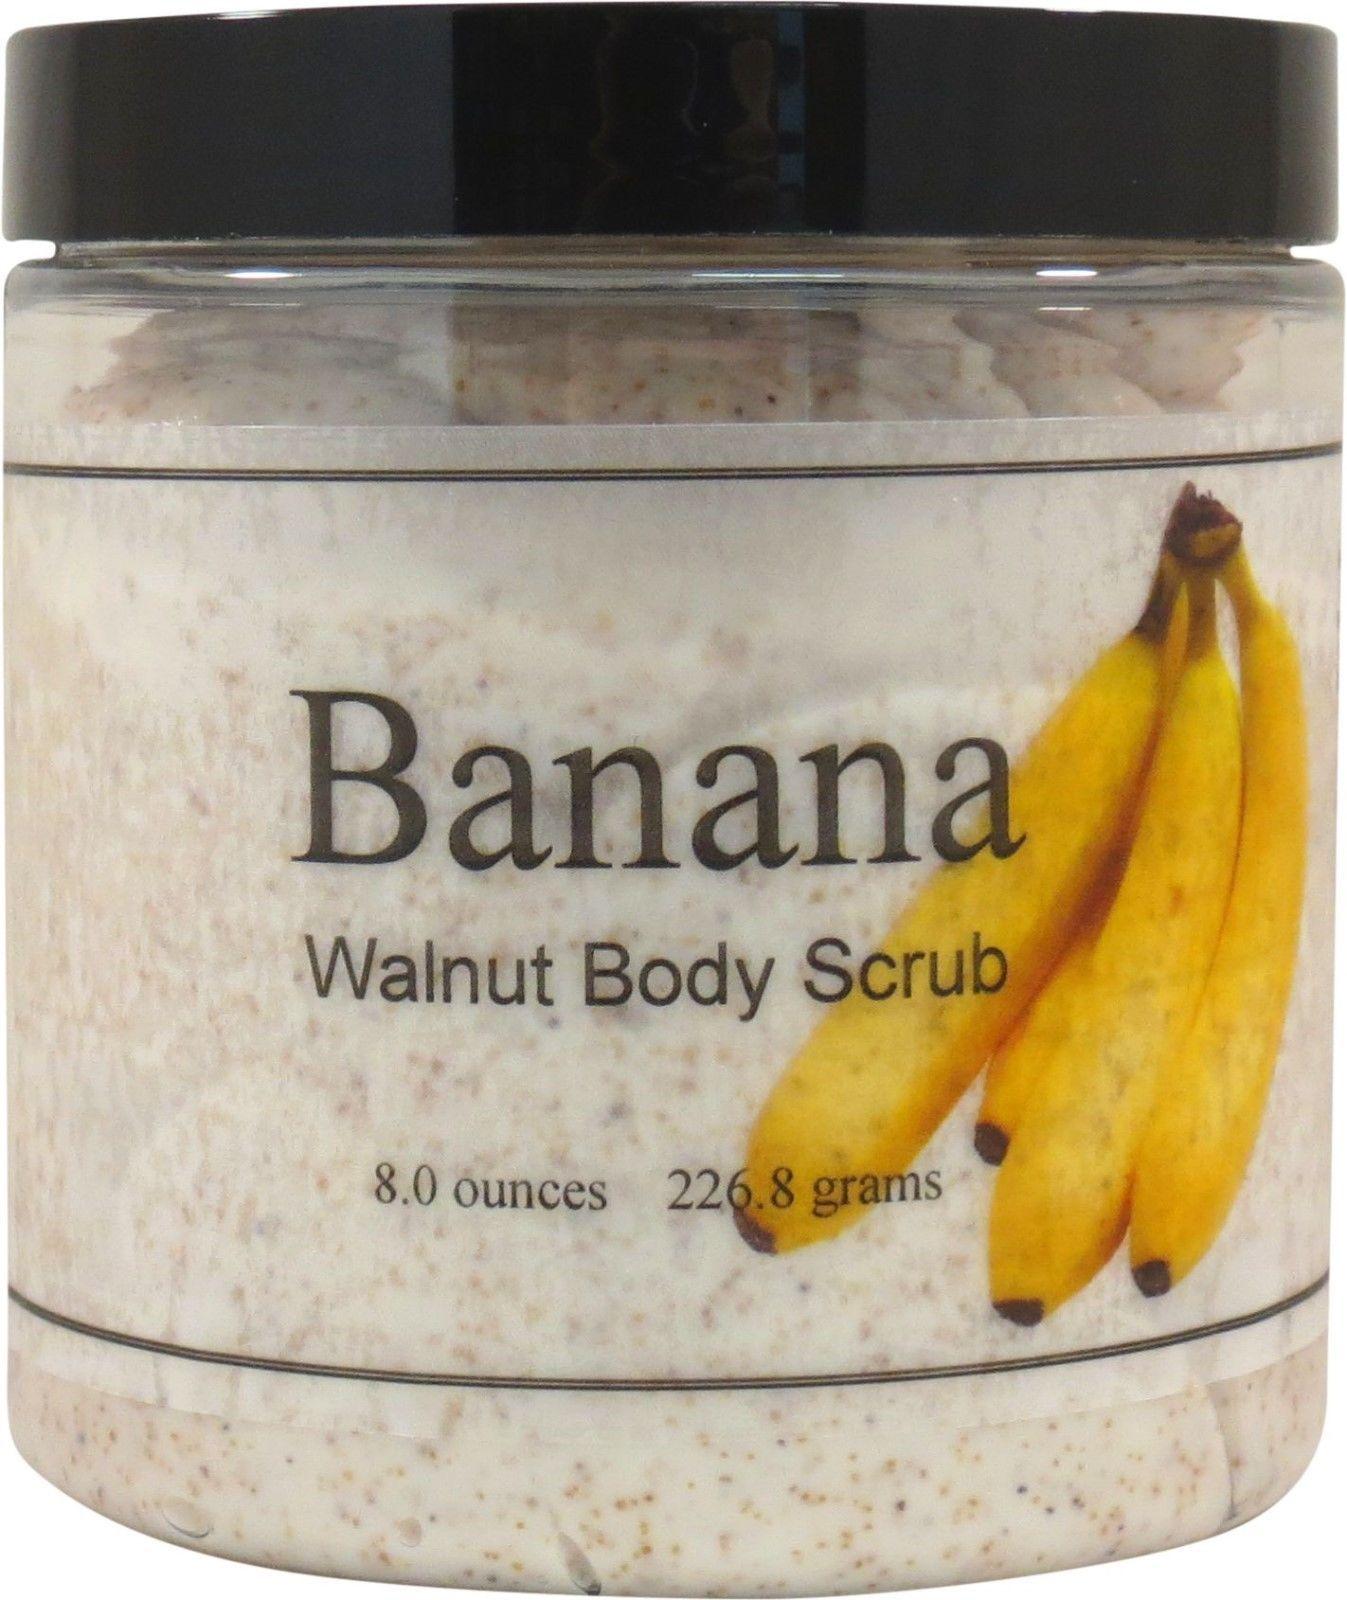 Banana Walnut Body Scrub